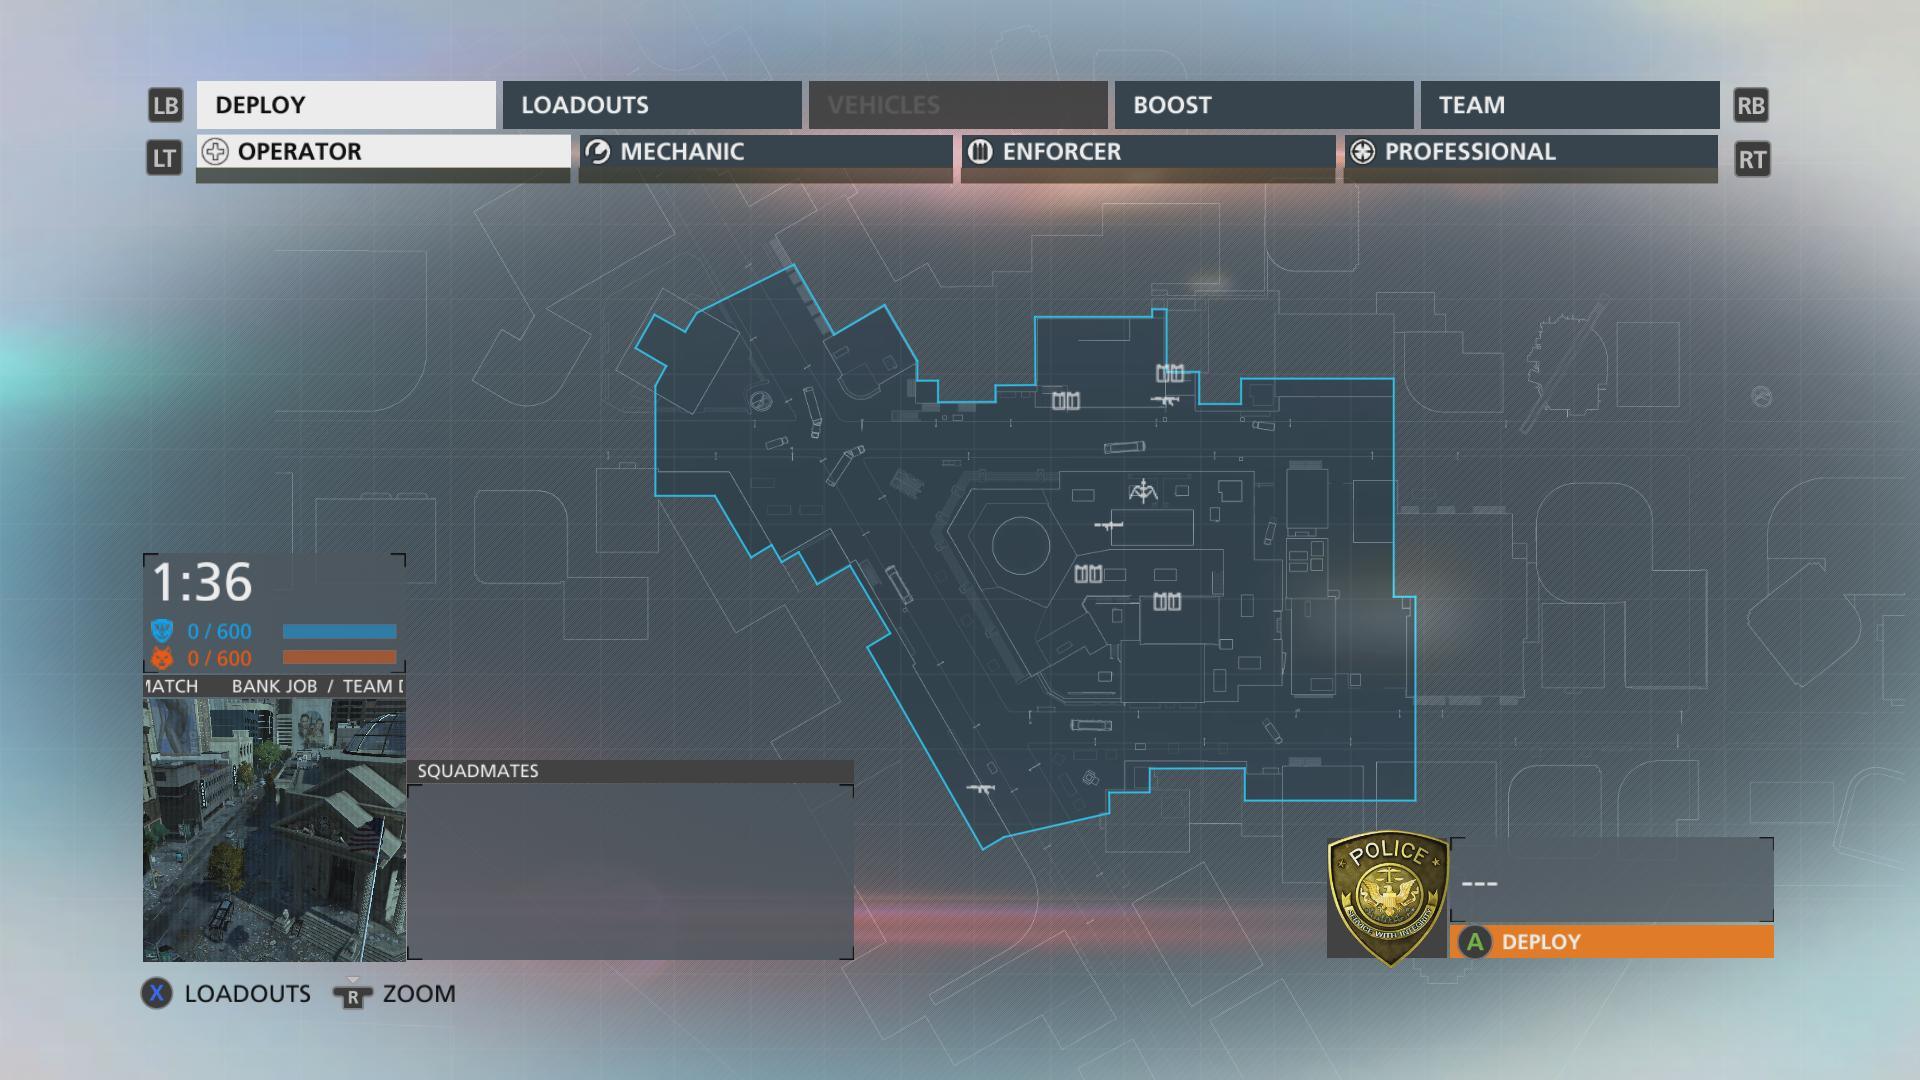 Battlefield Hardline - Deploy